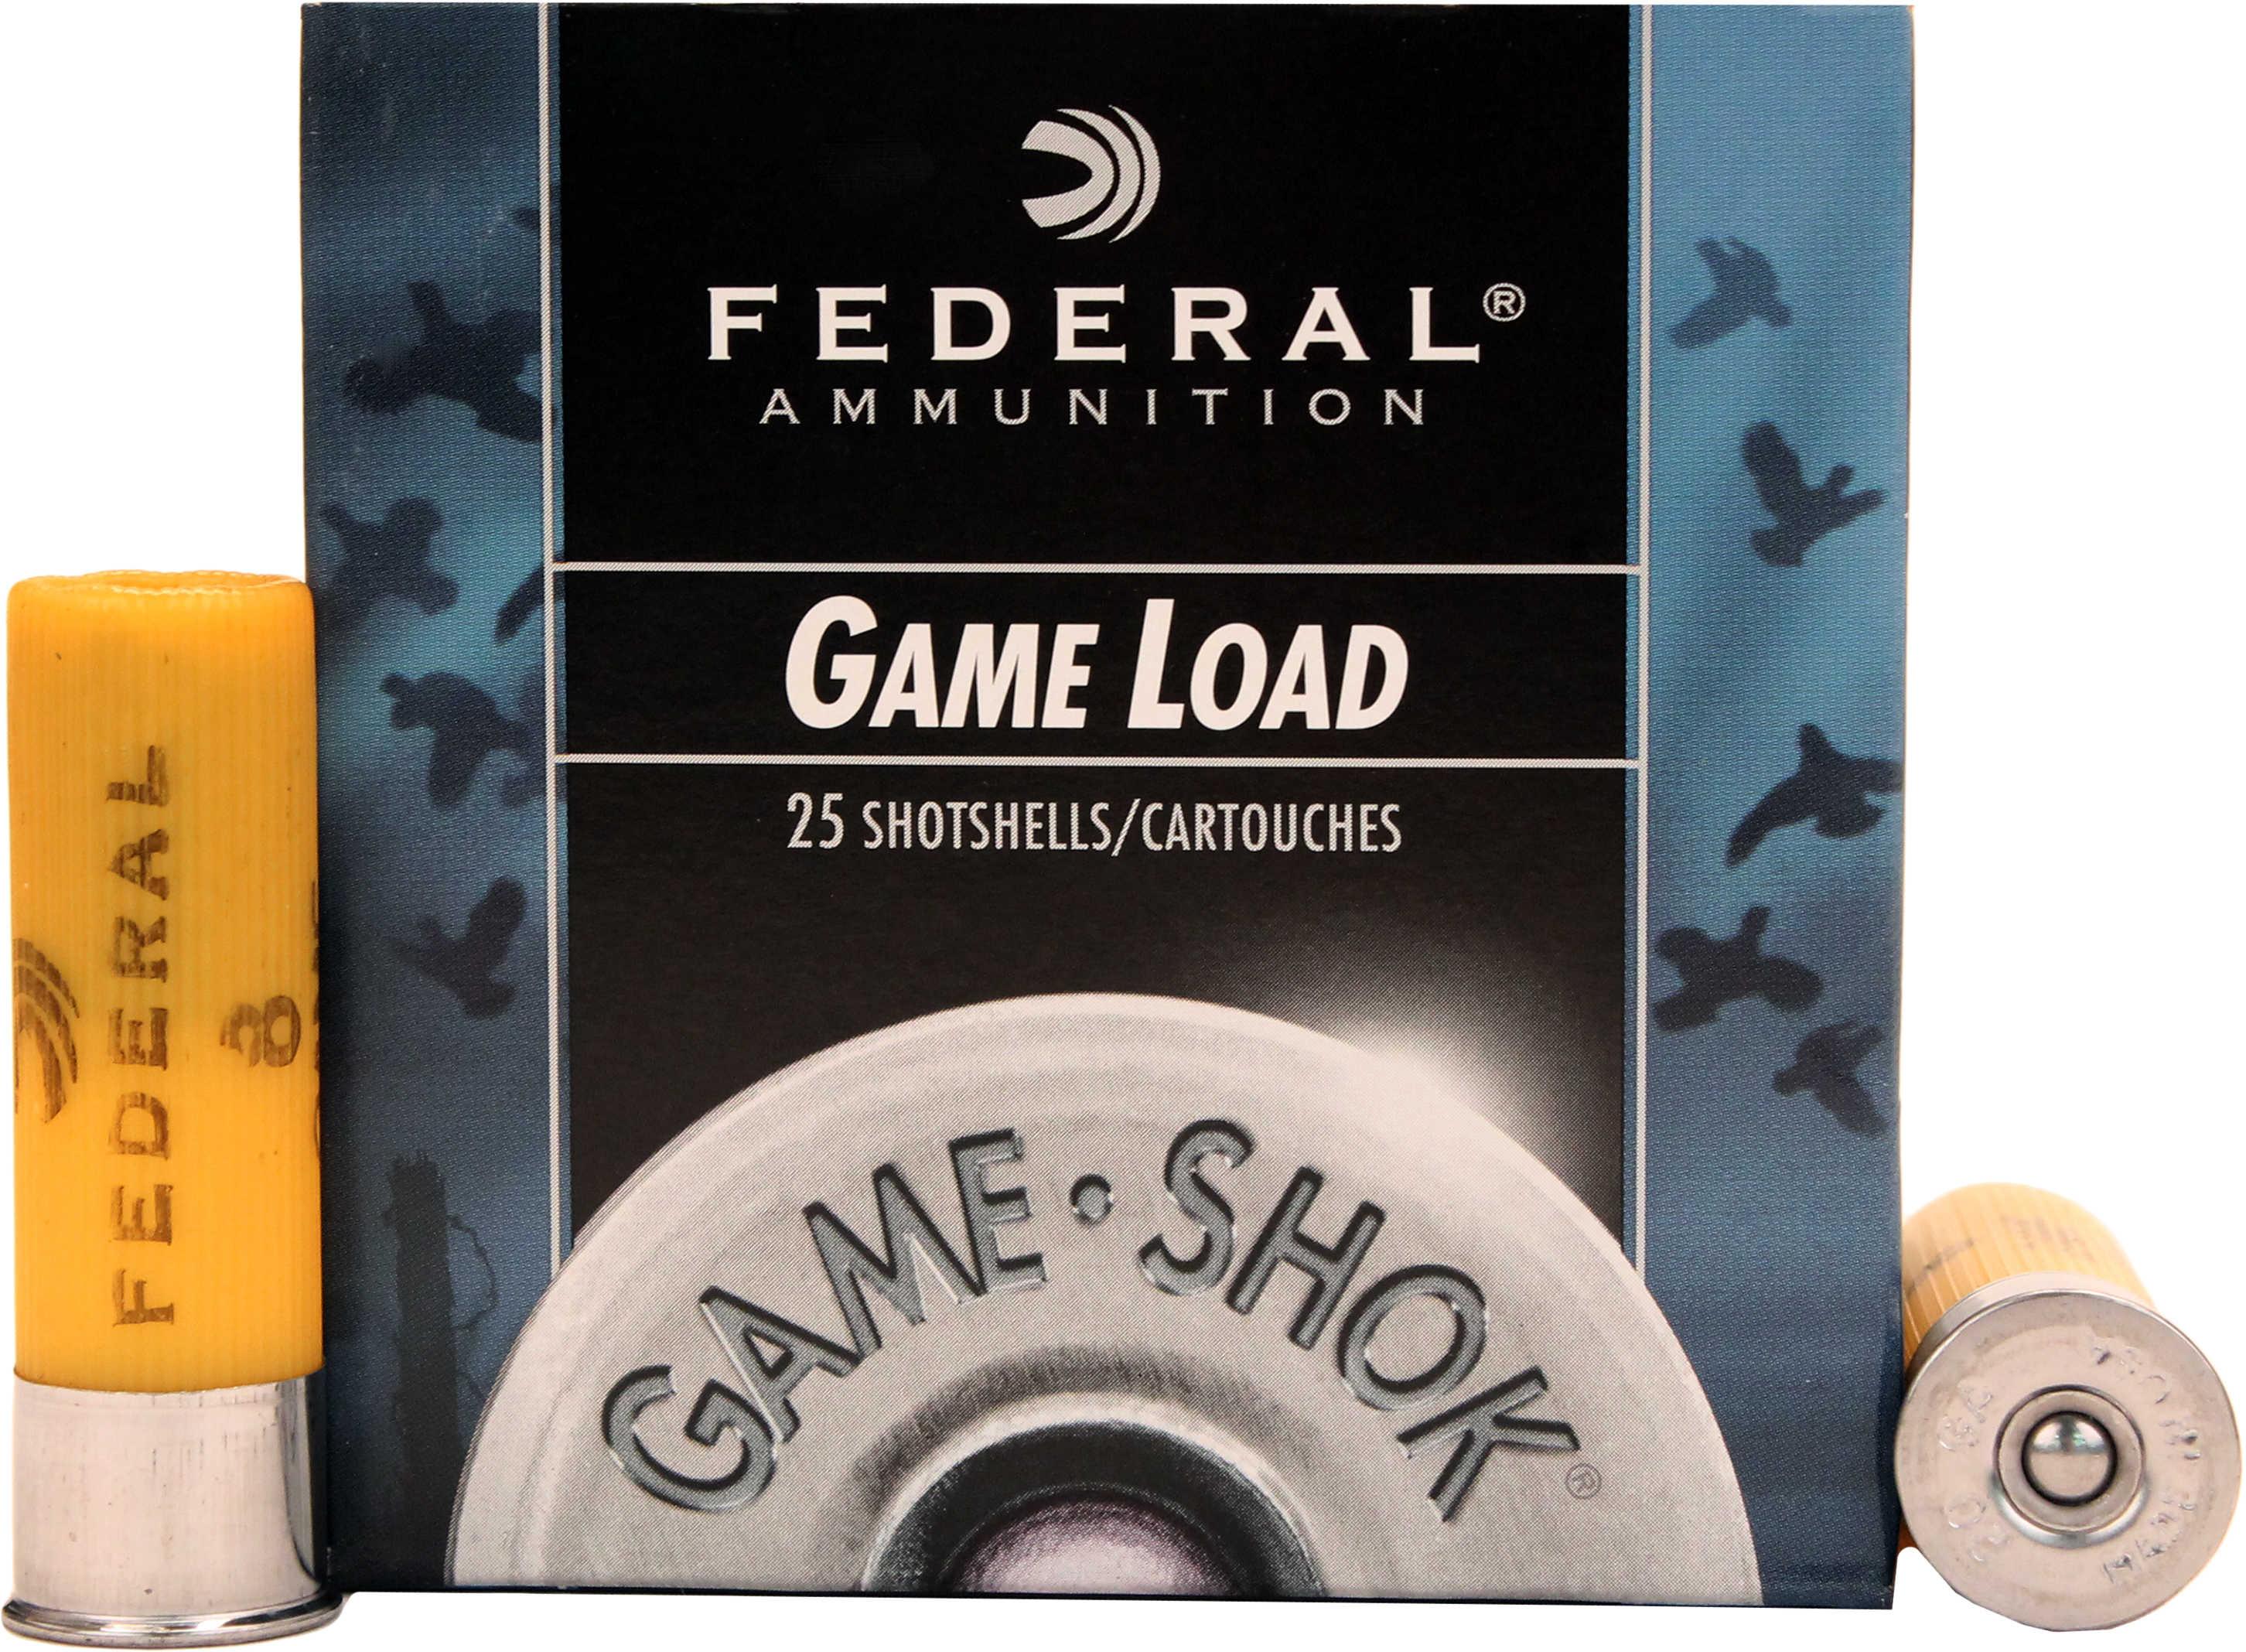 "Federal Cartridge 20 Gauge Shotshells Game Load 2 3/4"" 2 1/2 dram 7/8oz 8 Shot (Per 25) H2008"